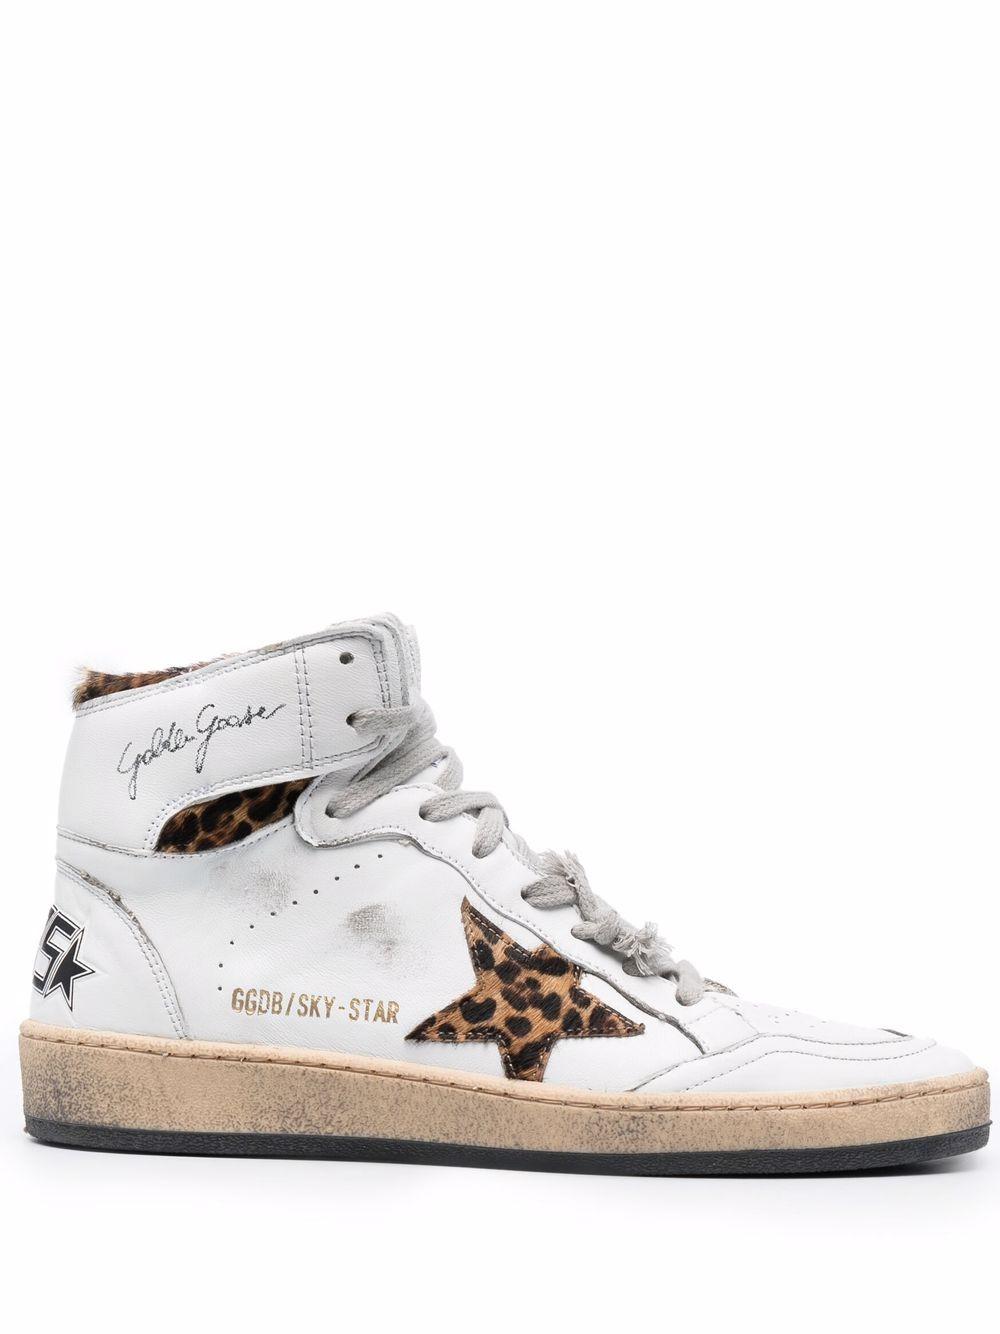 Picture of Golden Goose Deluxe Brand | Sky Star Sneakers